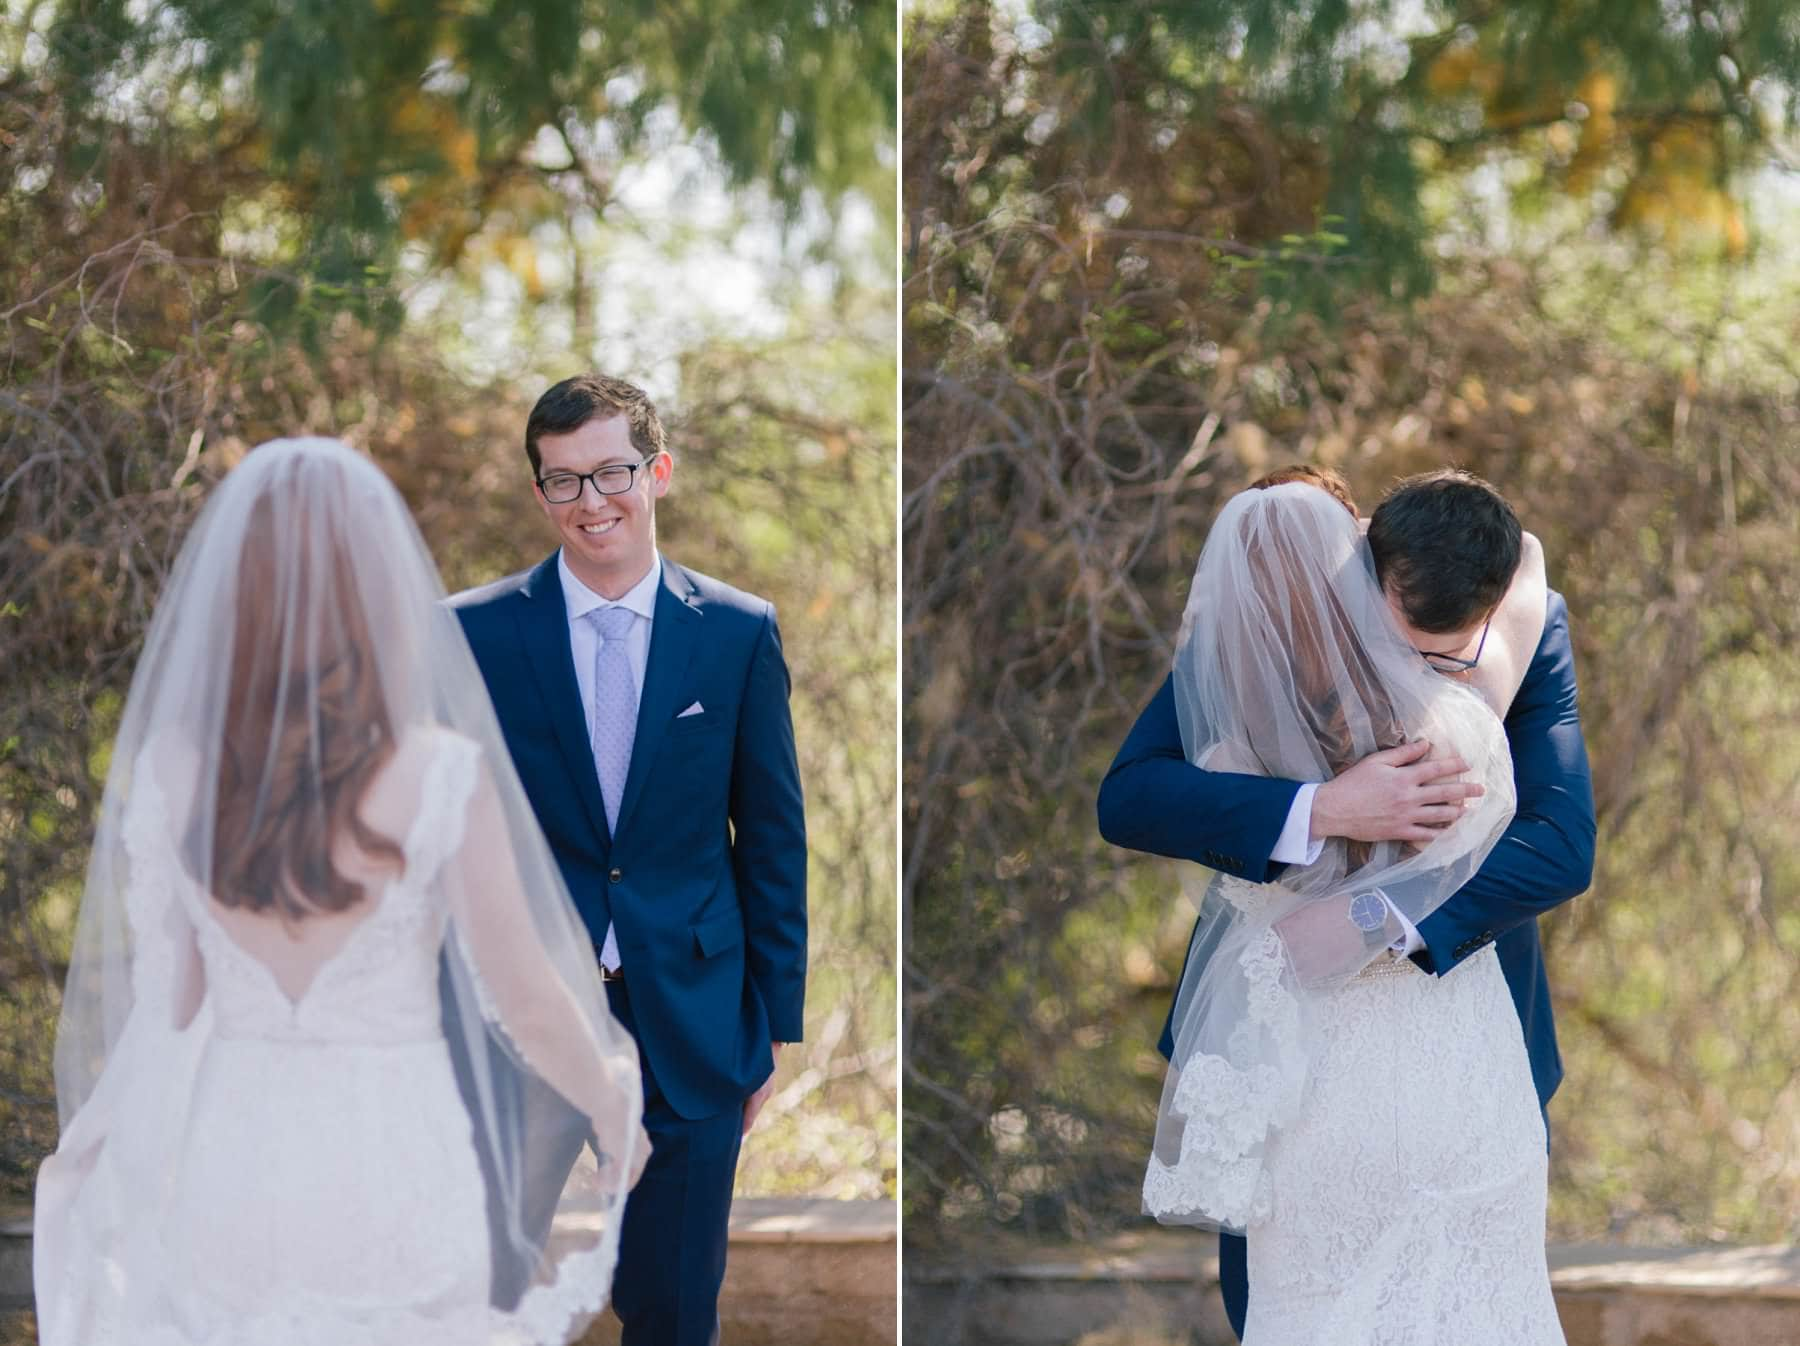 bride & groom first look at Phoenix Zoo wedding